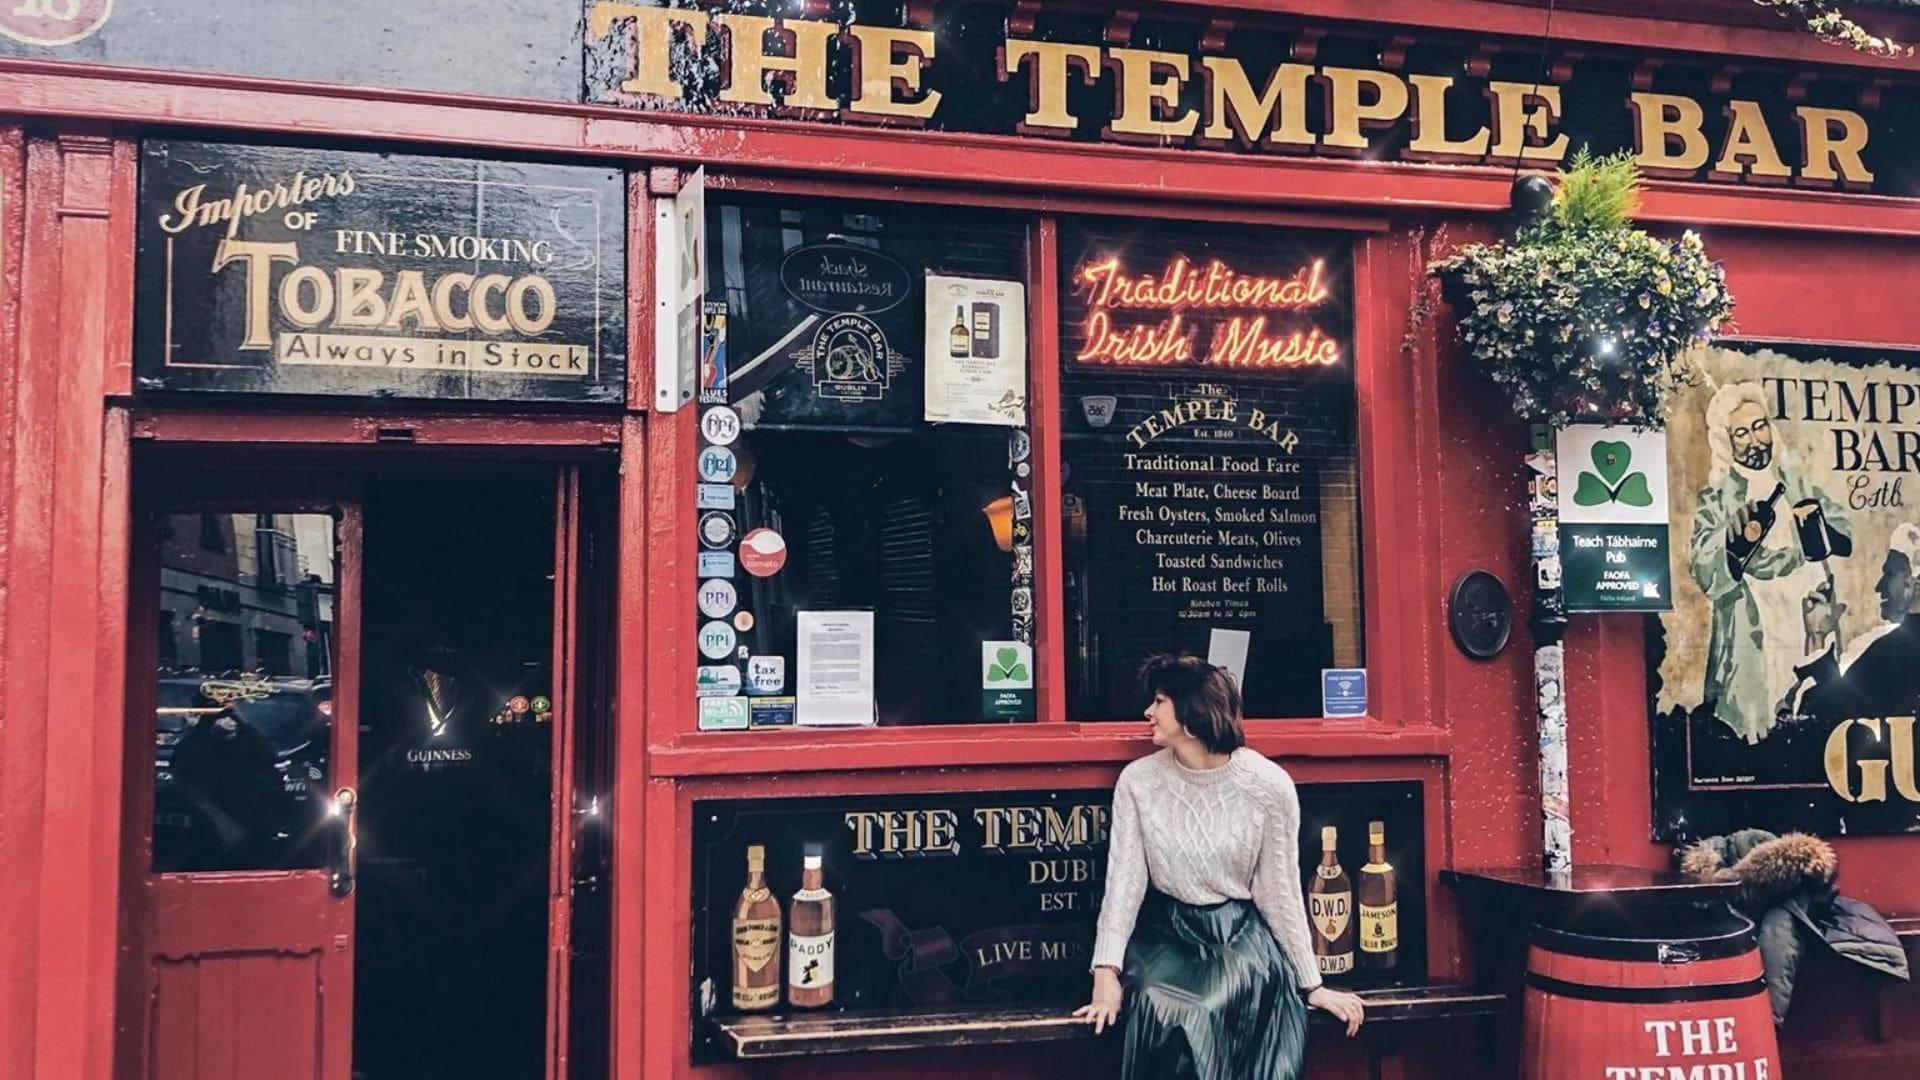 Dublino-temple-bar